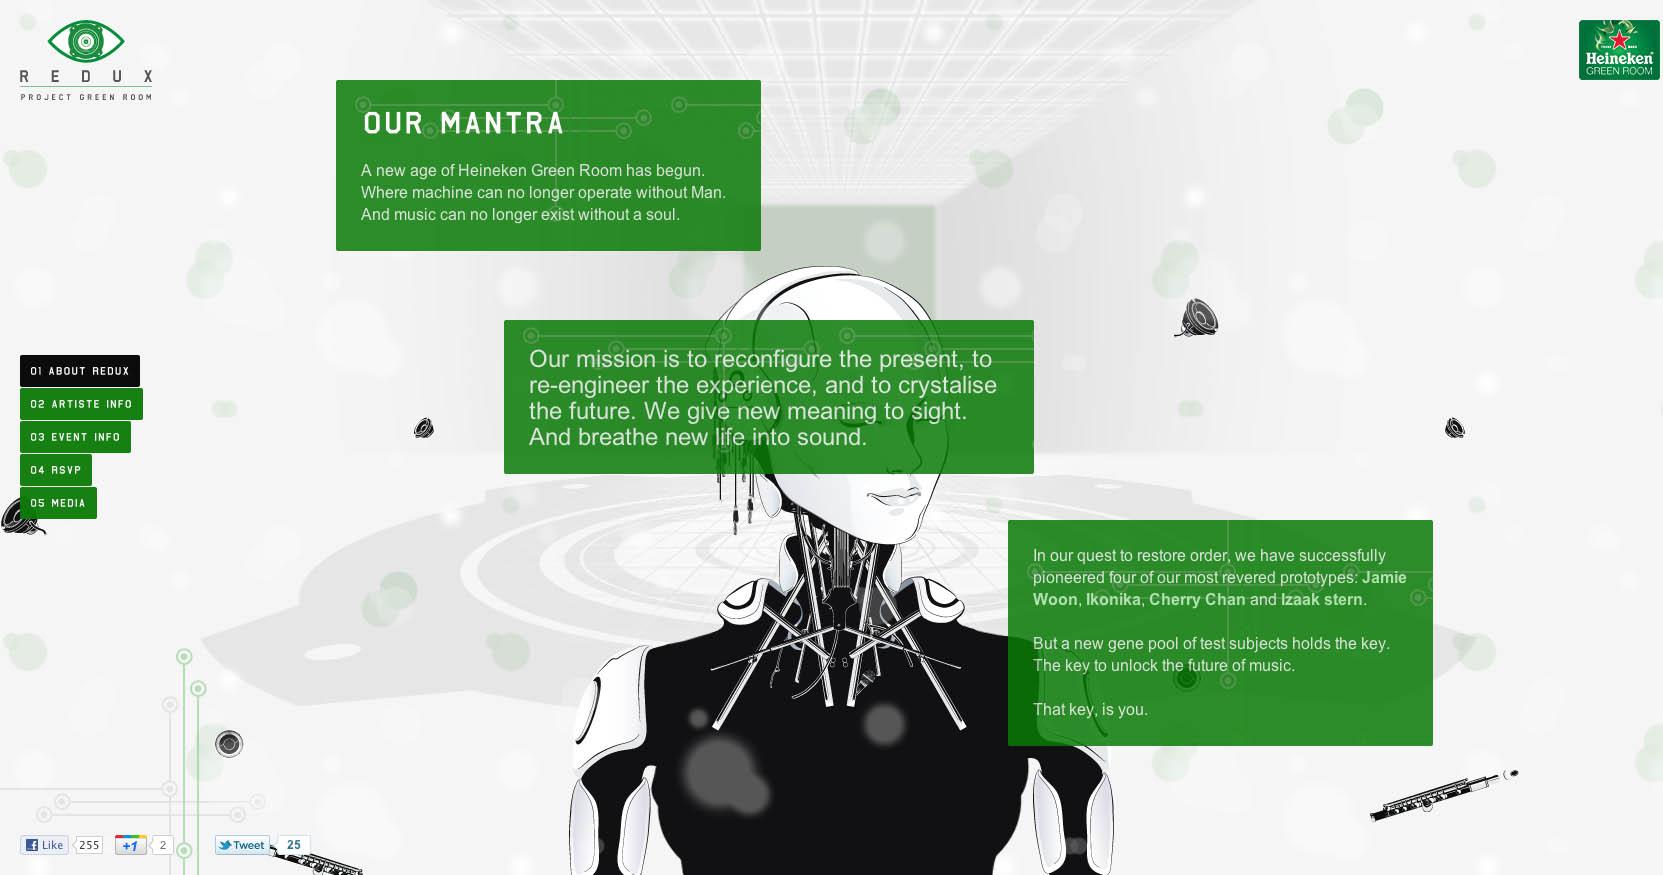 Redux: Project Green Room Website Screenshot